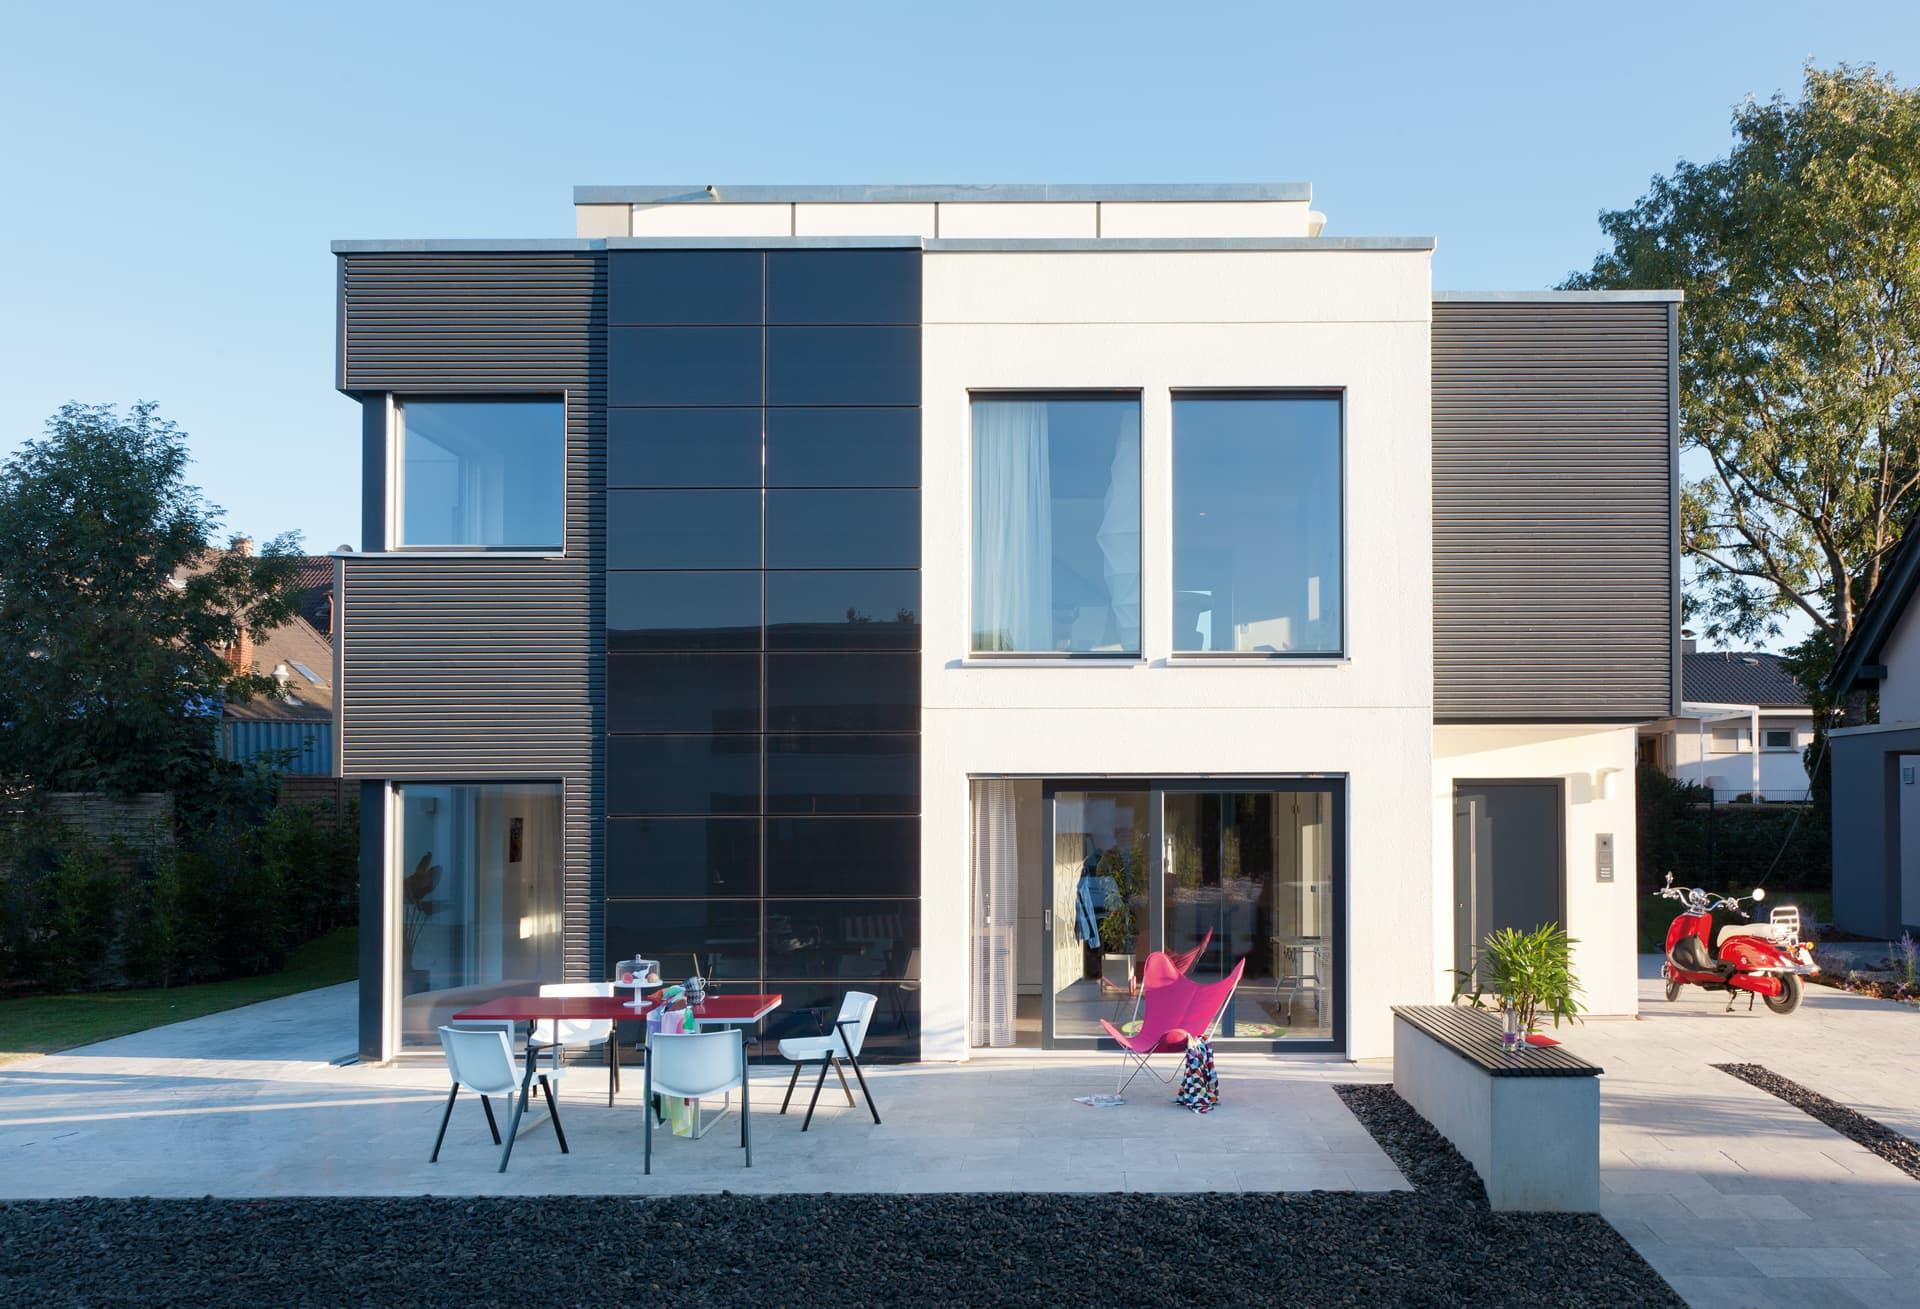 schw rerhaus moderner kubus. Black Bedroom Furniture Sets. Home Design Ideas